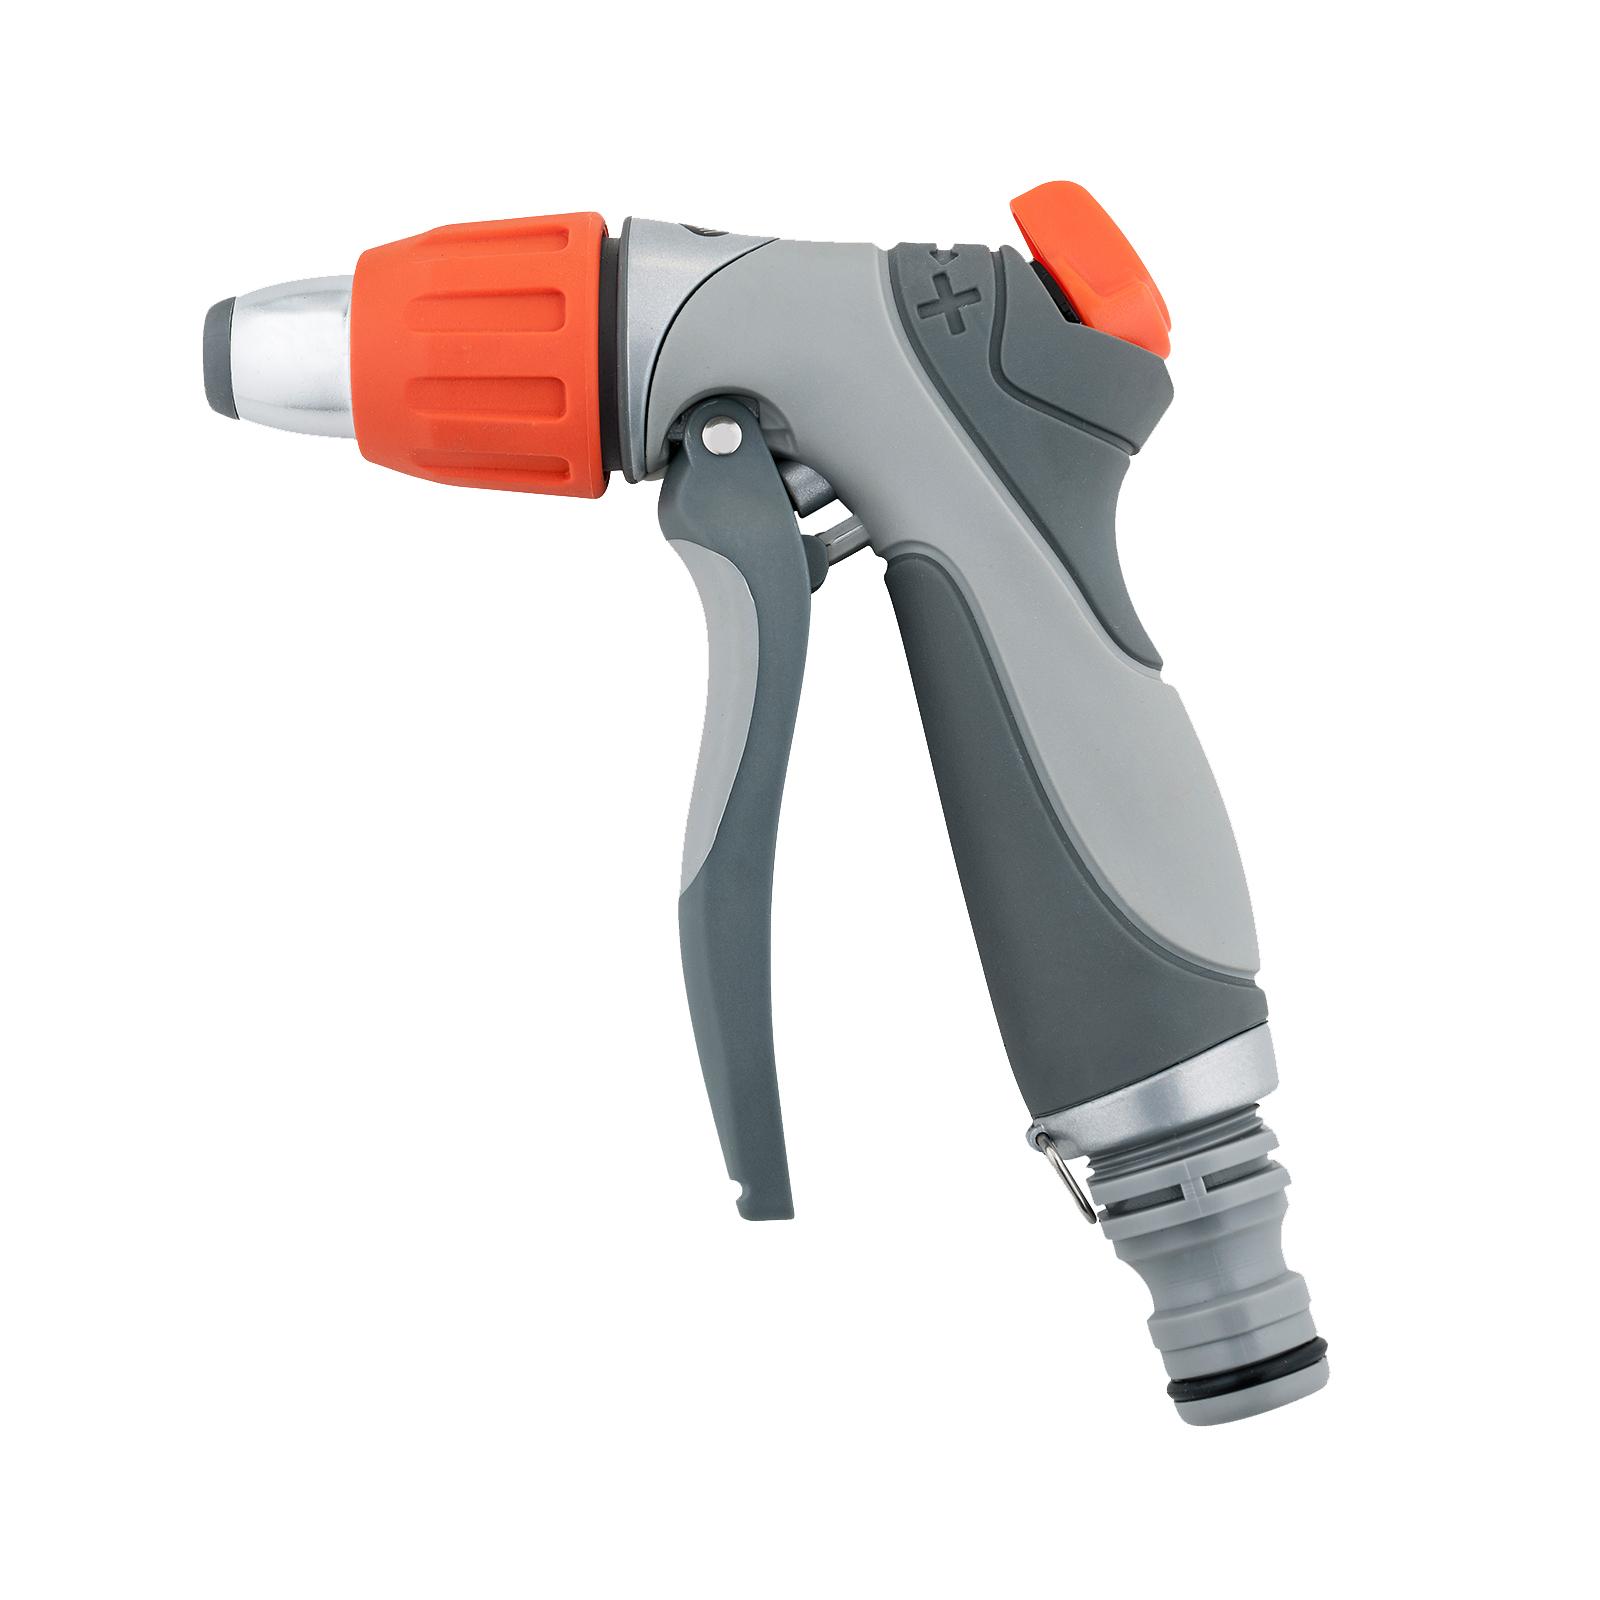 Pope Deluxe Hand Spray Gun